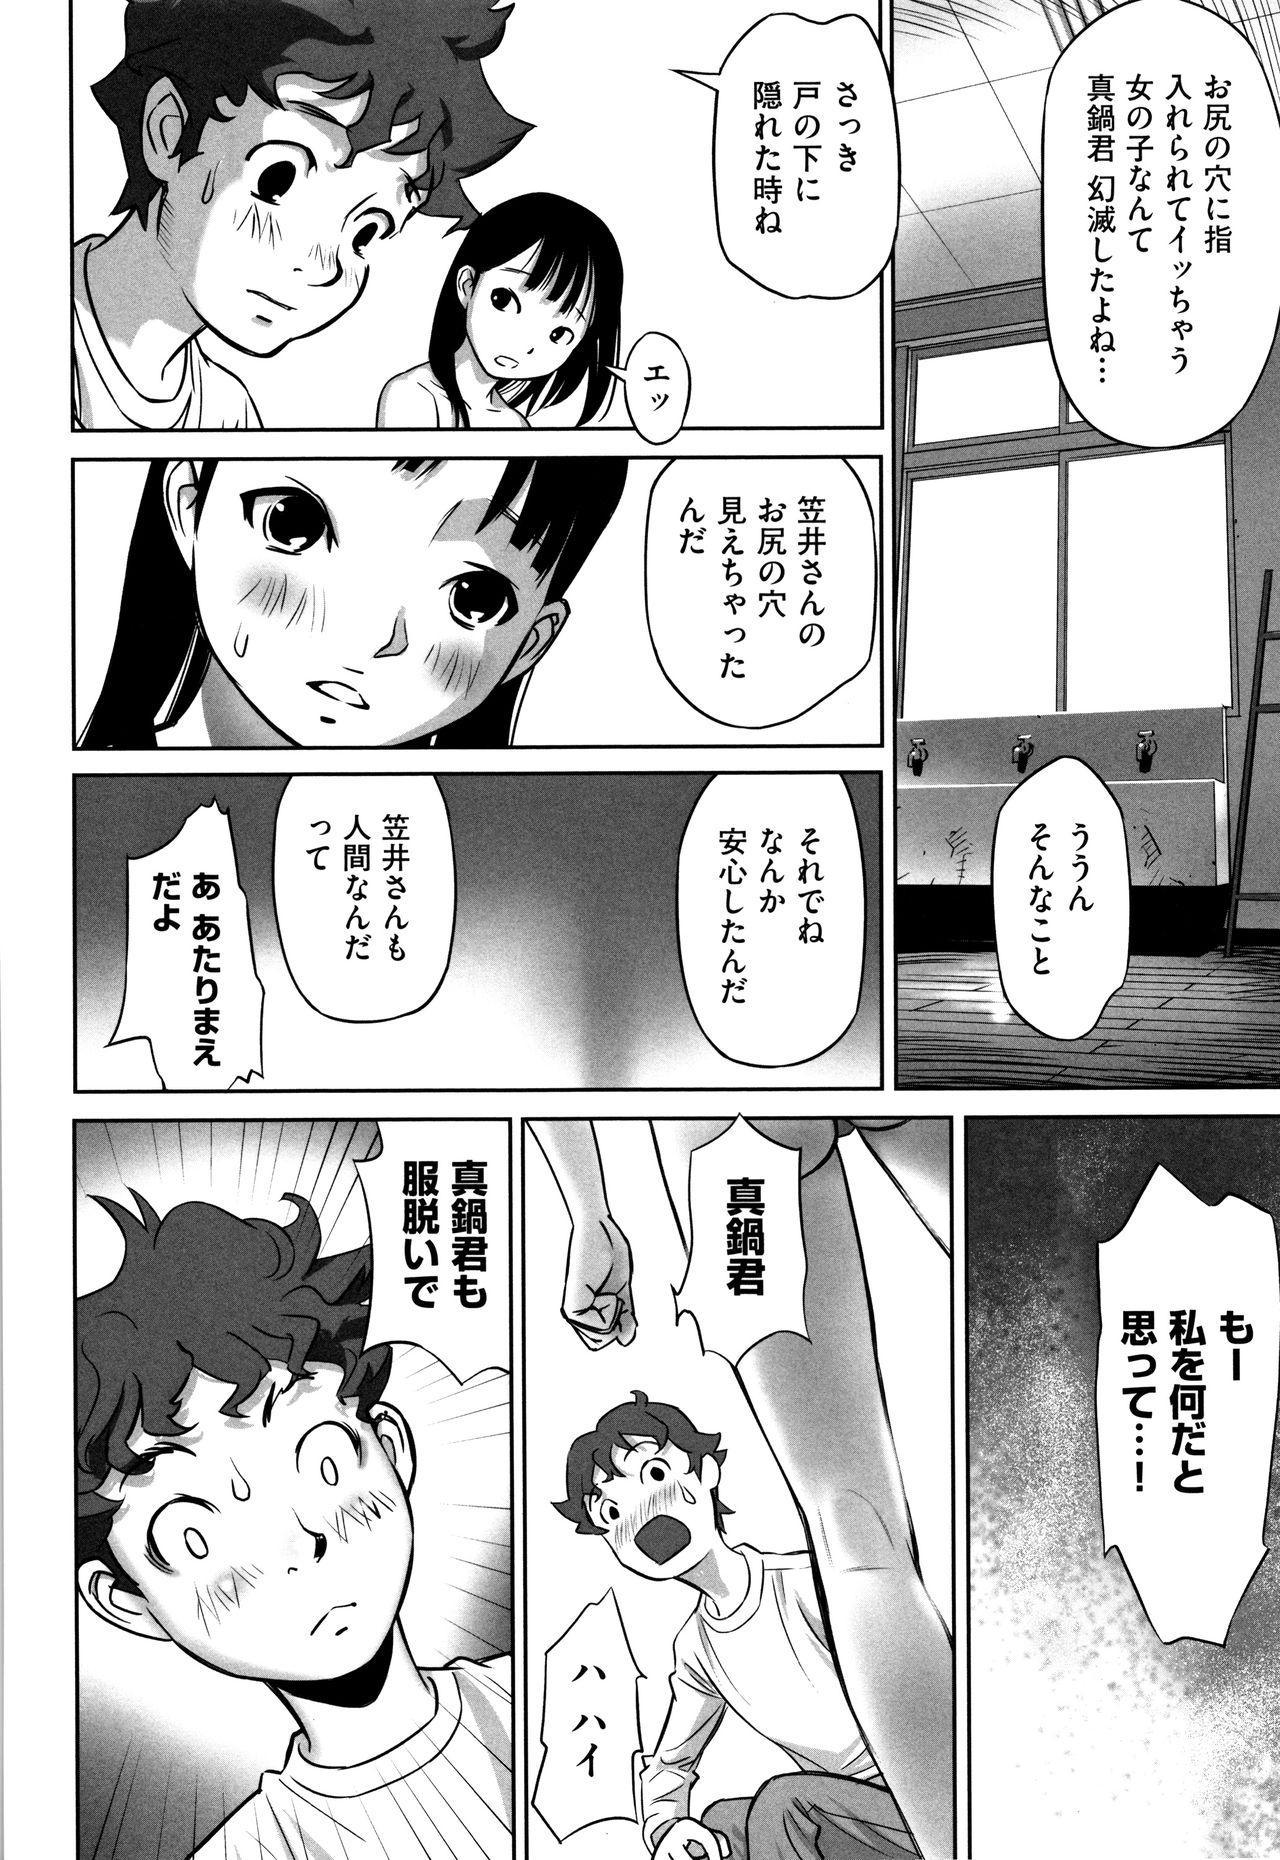 Shoujo Kumikyoku 7 56